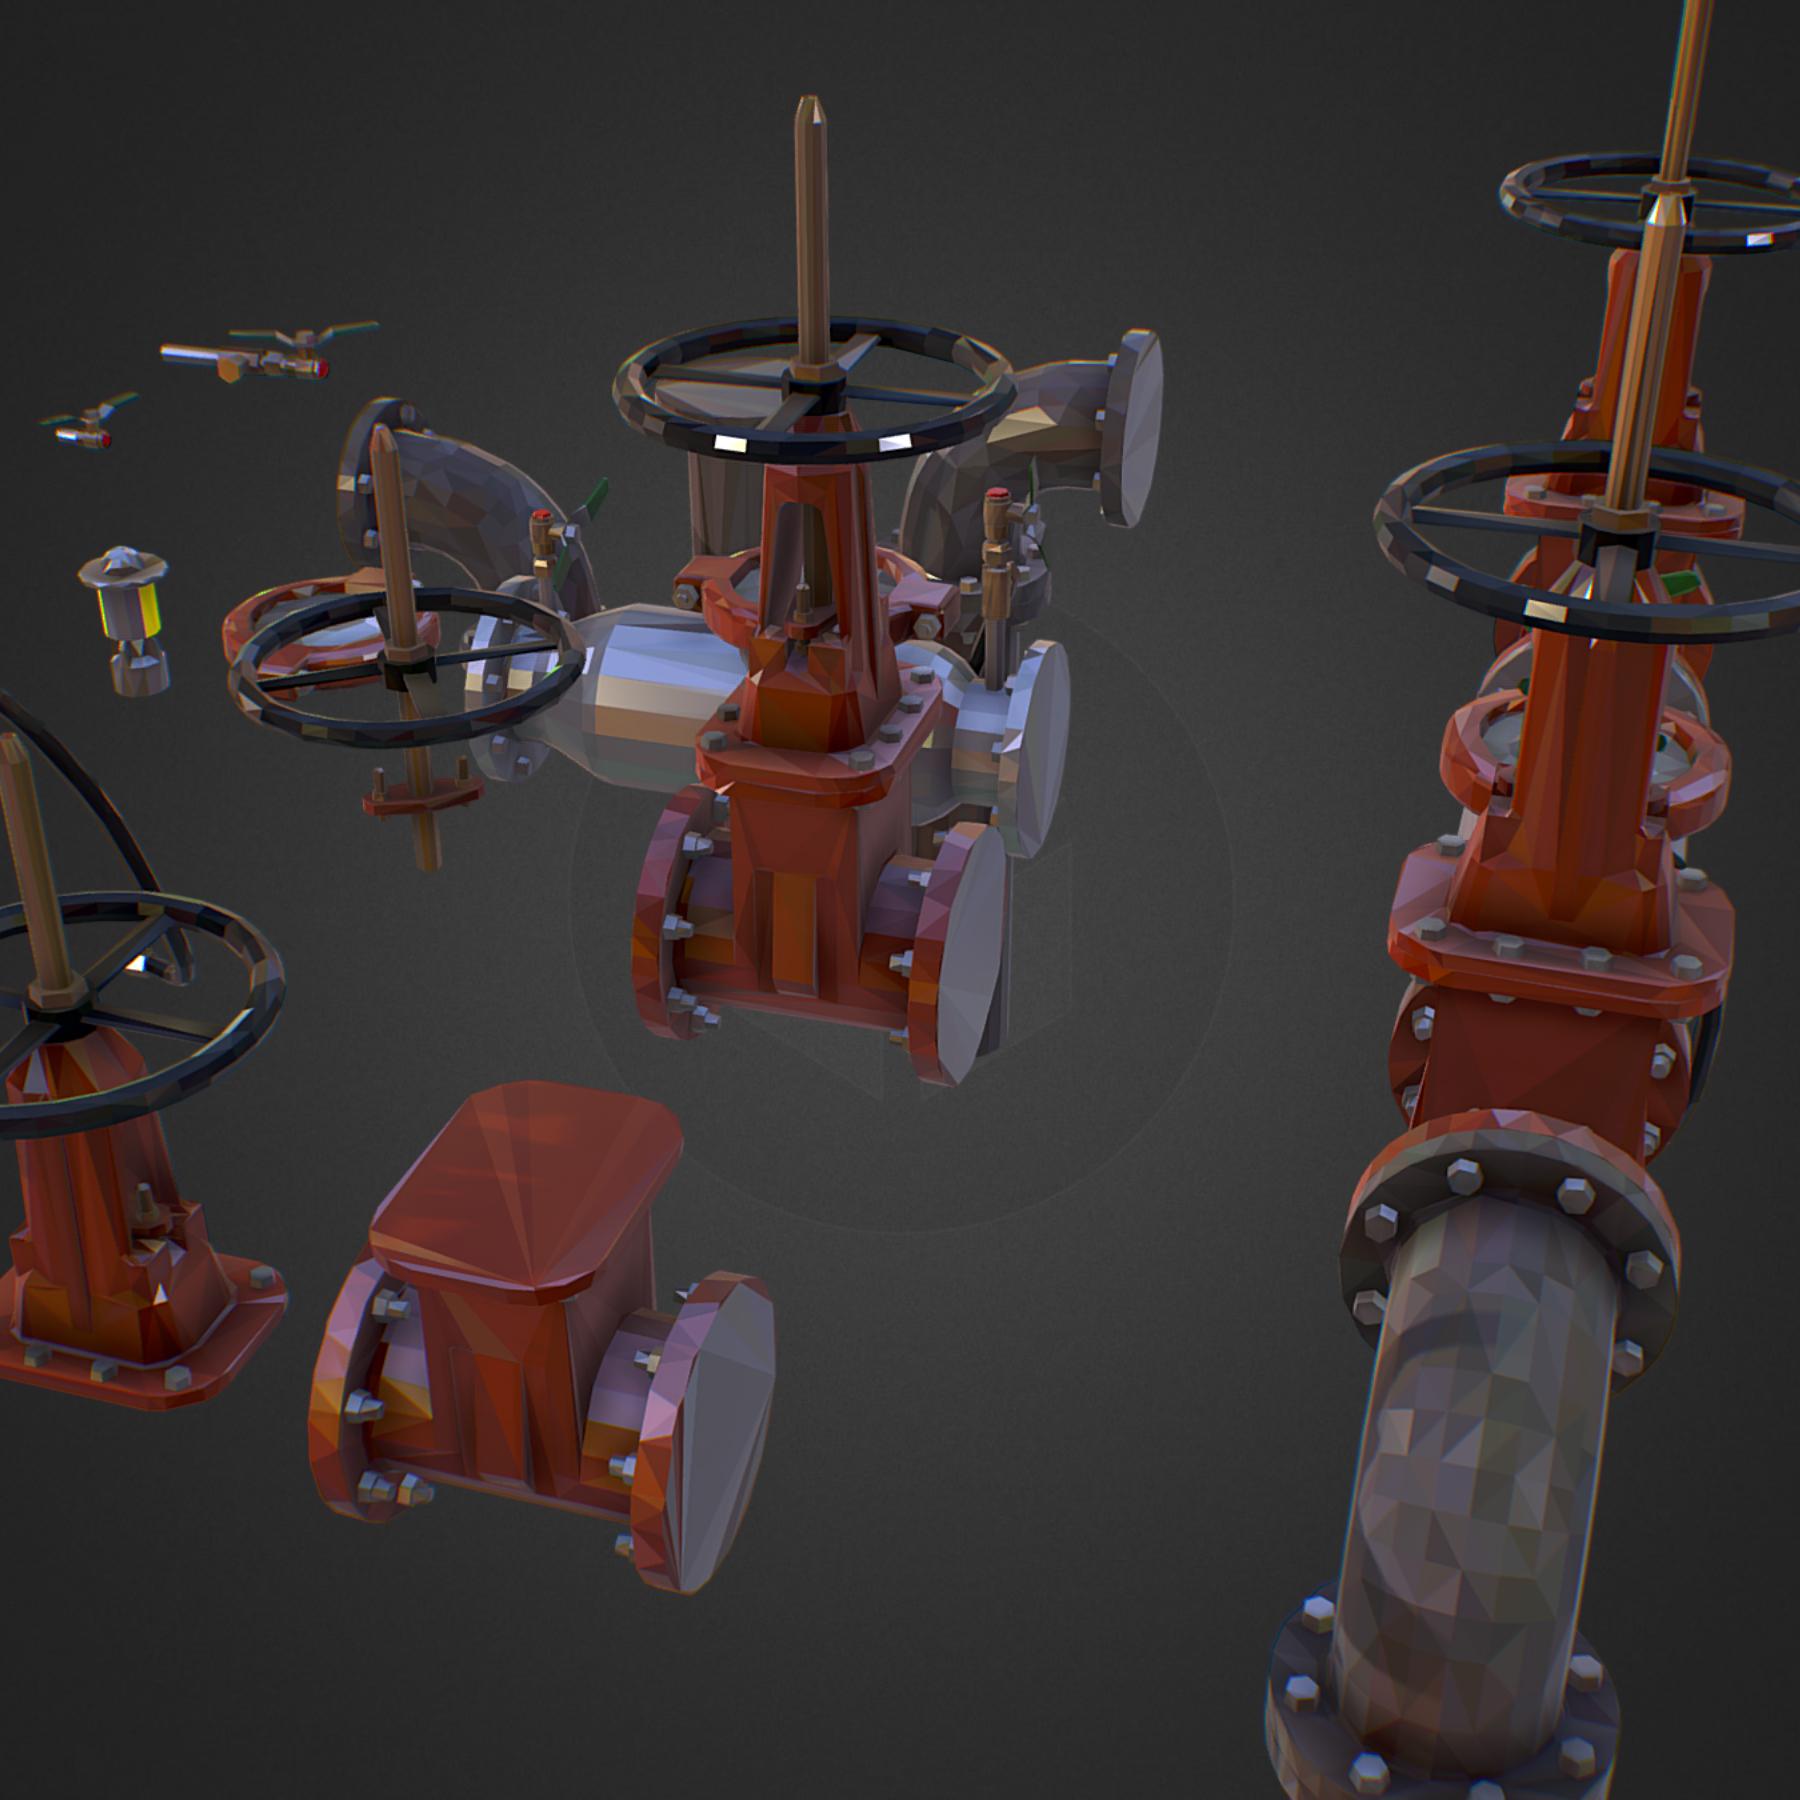 Low Poly ART Backflow Water Pipe Constructor 3d model max 3ds max plugin fbx ma mb tga targa icb vda vst pix obj 272544